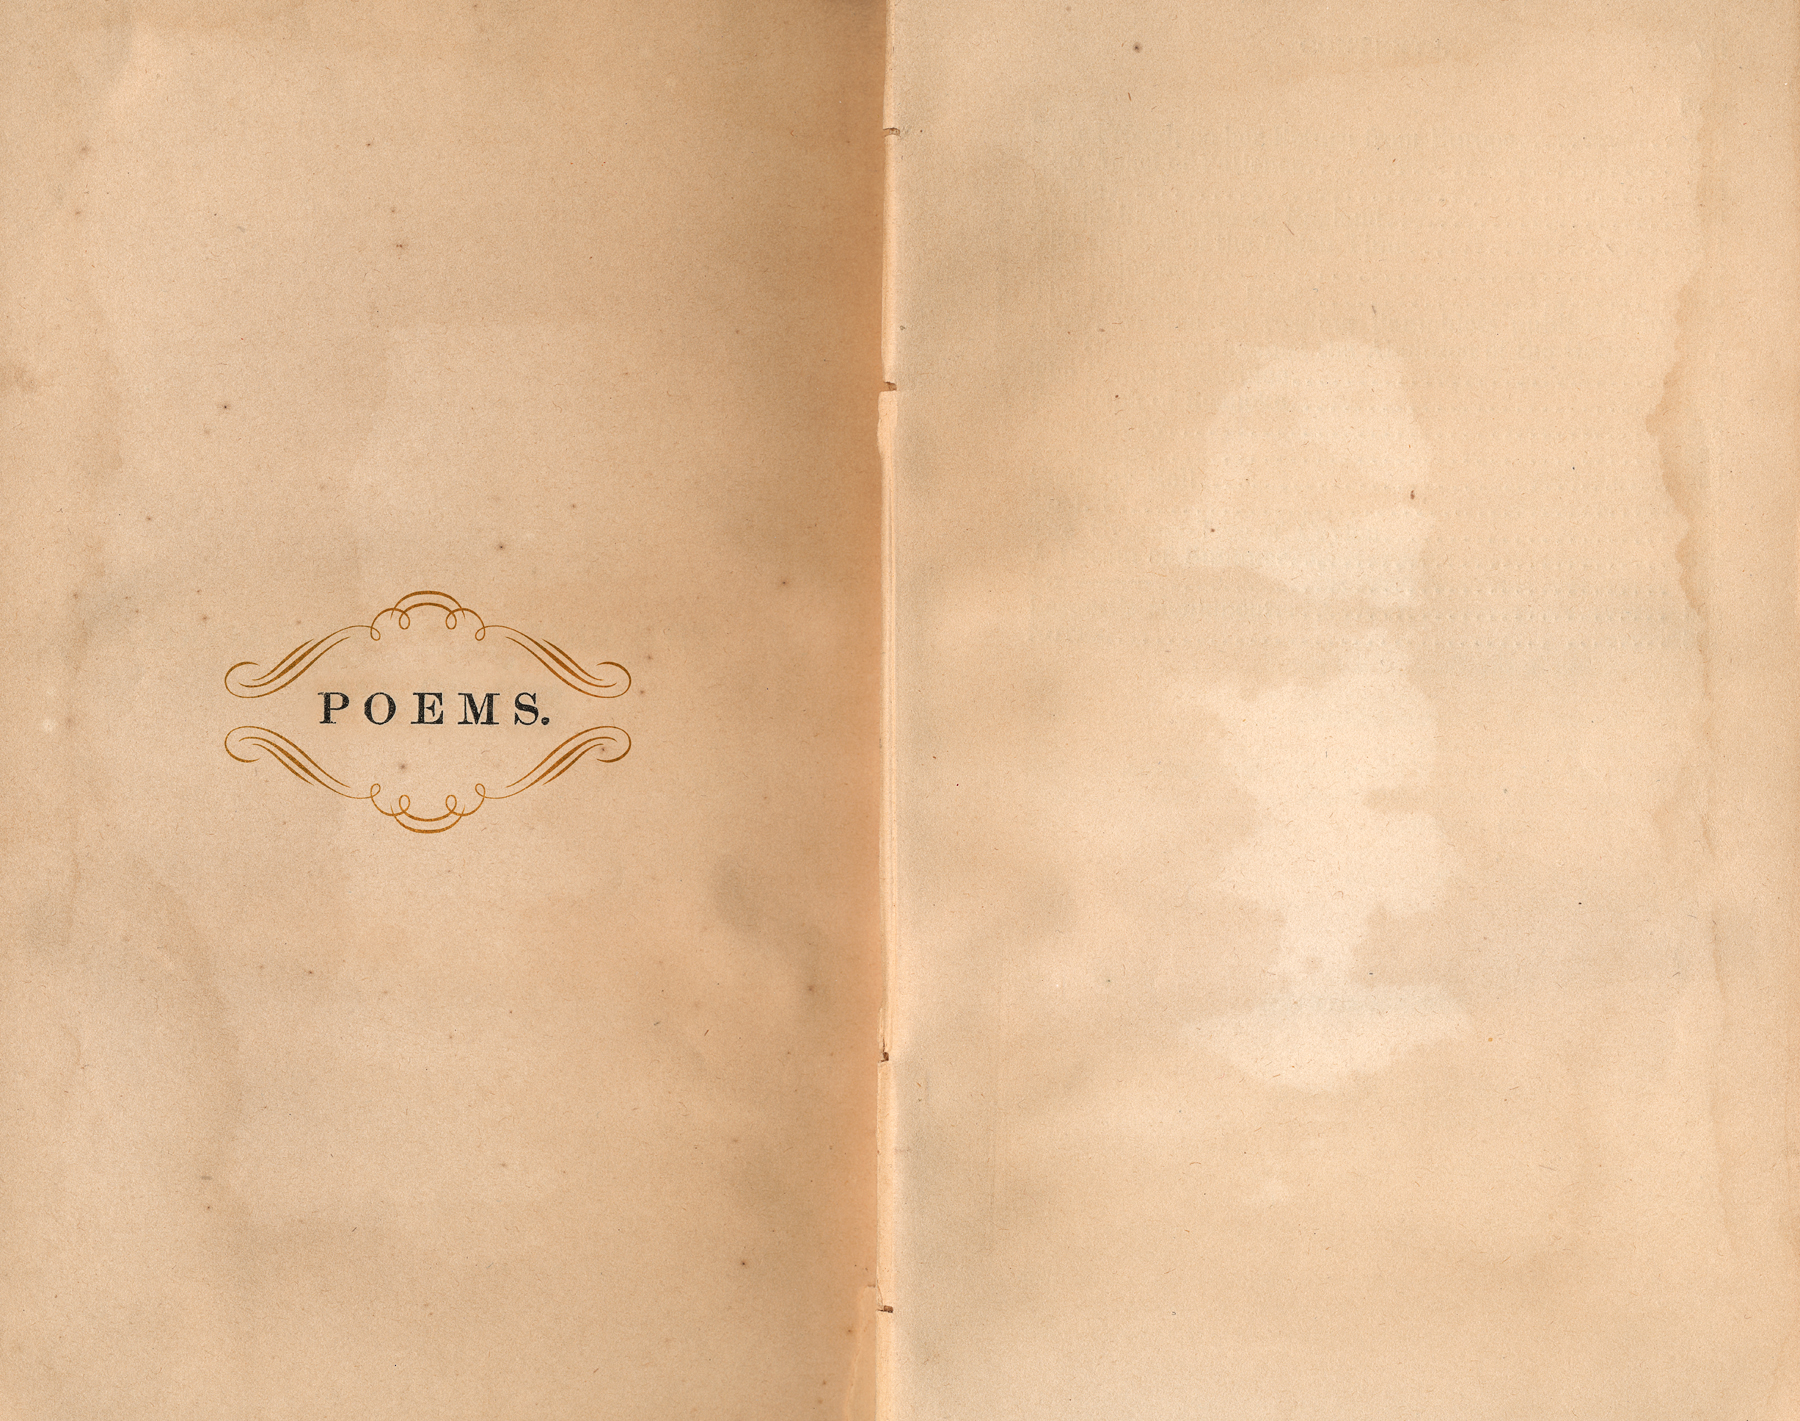 Antique poems paper template photo